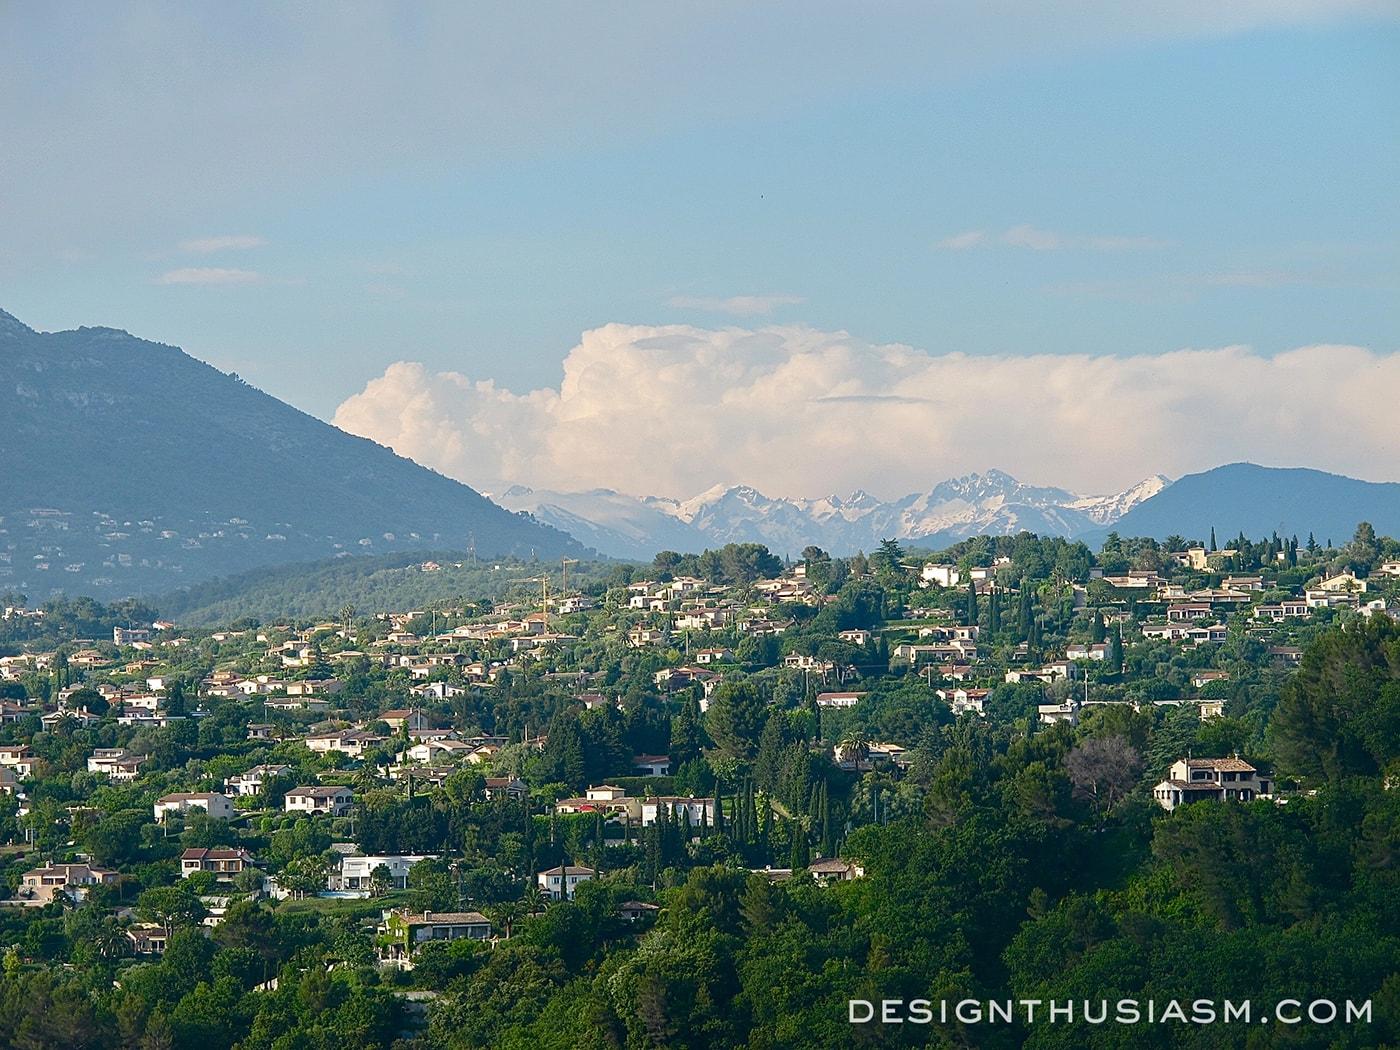 Saint-Paul-de-Vence - The Prettiest Hilltop Village in France - Designthusiasm.com